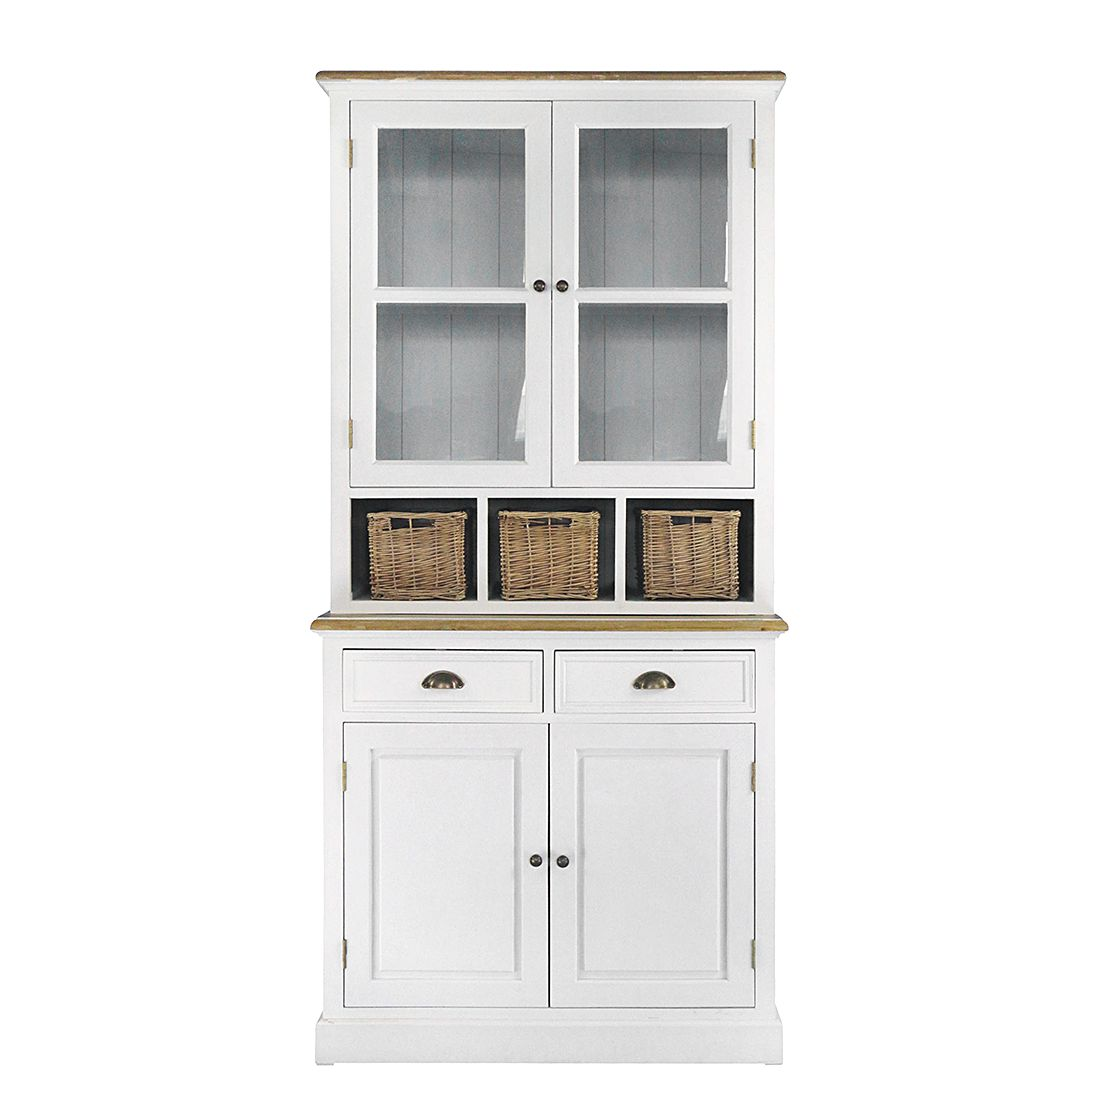 buffetschrank preis vergleich 2016. Black Bedroom Furniture Sets. Home Design Ideas